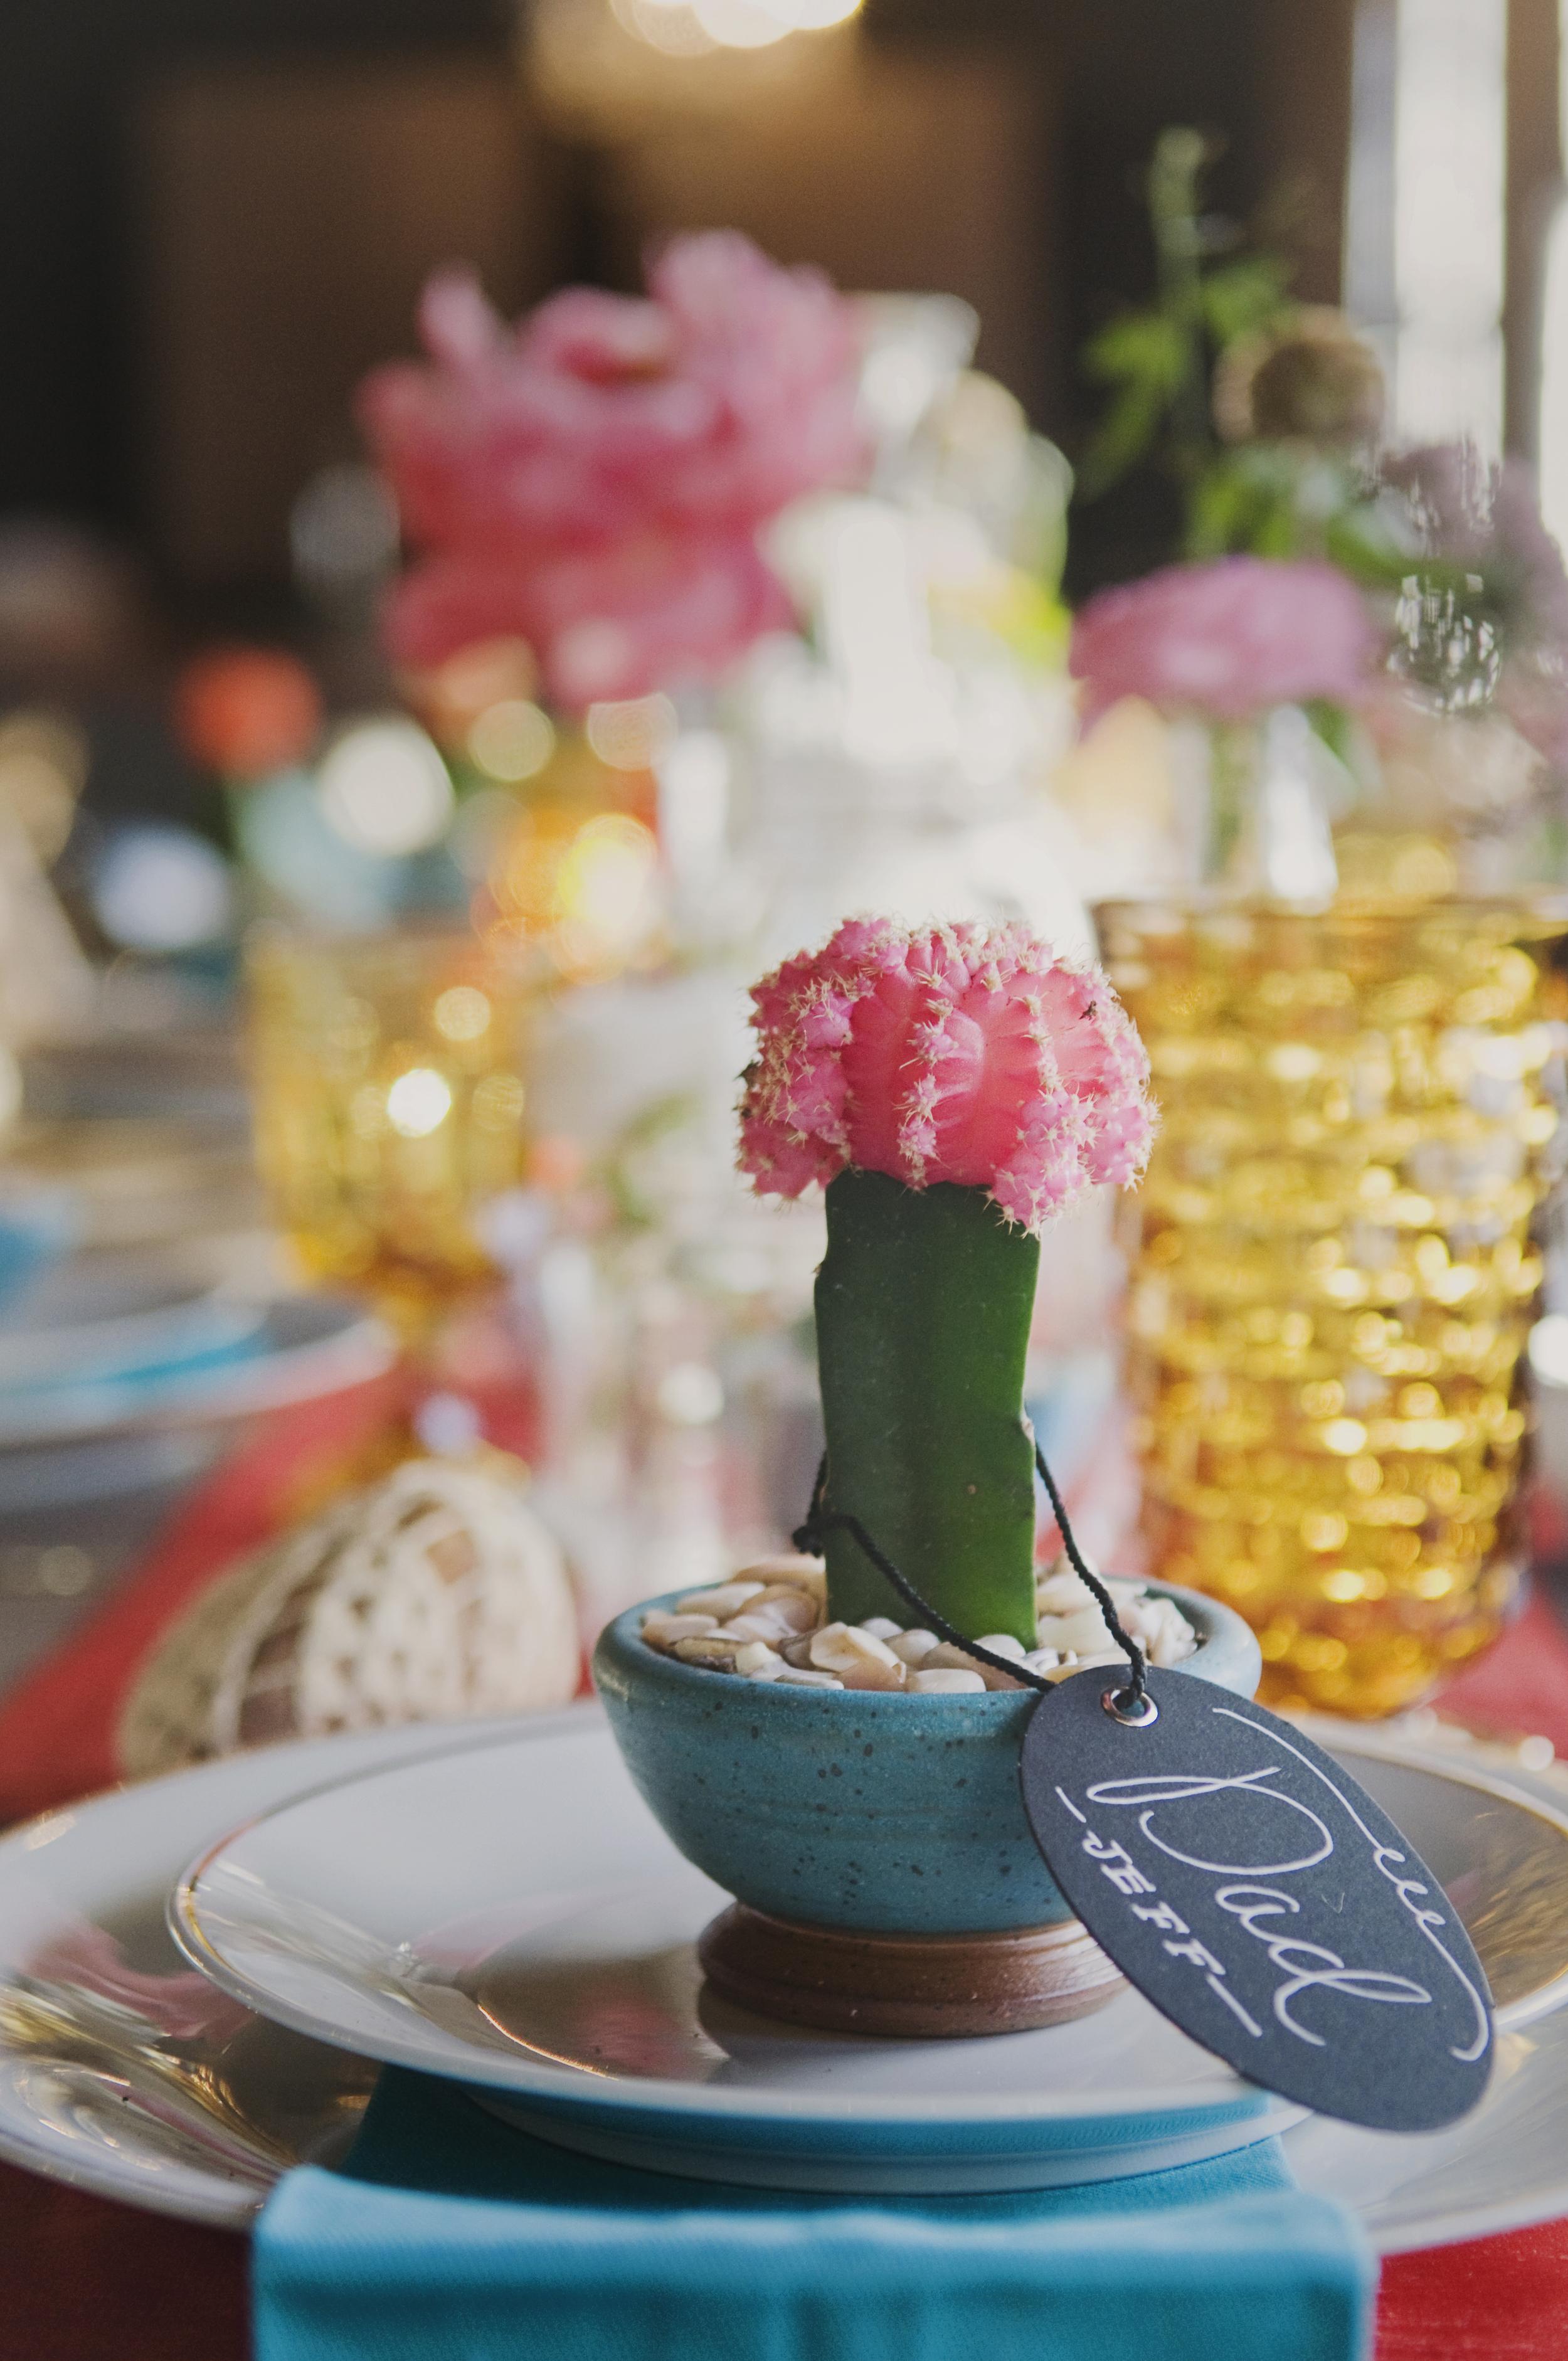 amber-and-david-ivory-and-beau-bridal-boutique-lytle-foto-savannah-wedding-dresses-savannah-wedding-planner-savannah-event-designer-savannah-weddings-wormsloe-wedding-cohens-retreat-wedding-indie-wedding-handmade-wedding-historic-38.jpg